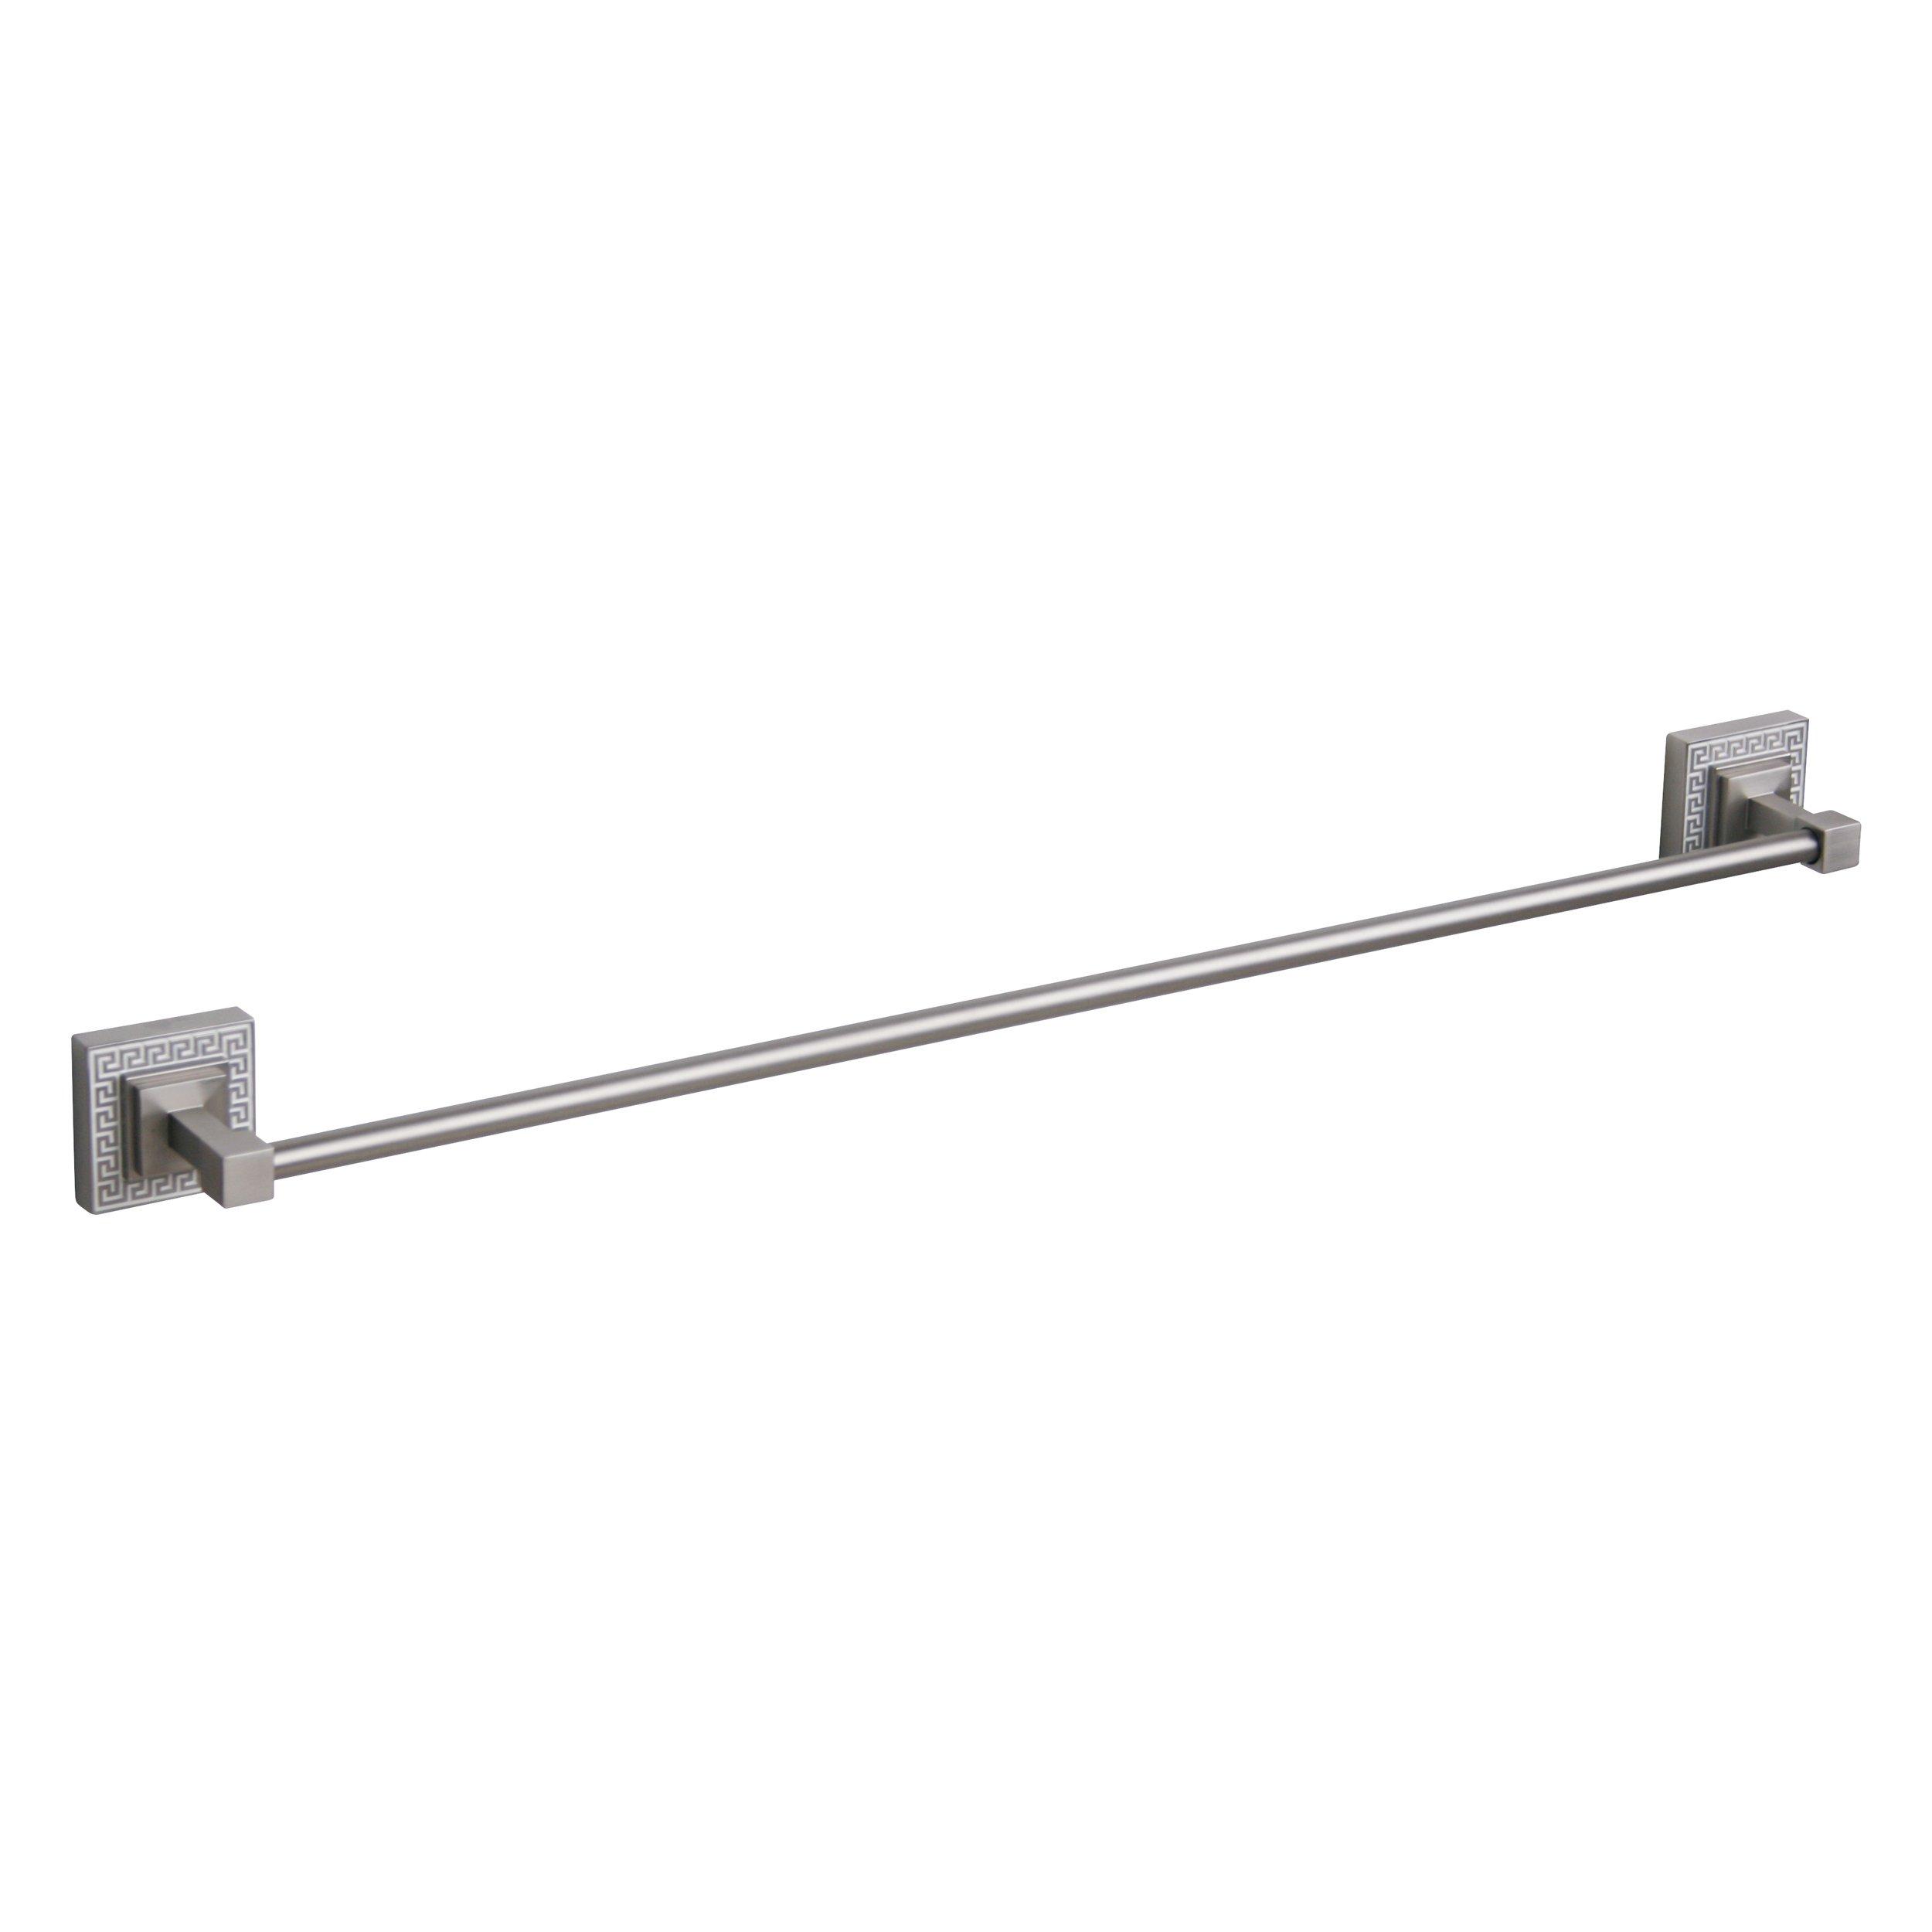 Elegant Home Fashions Greek Key 18-Inch Towel Bar, Brushed Nickel